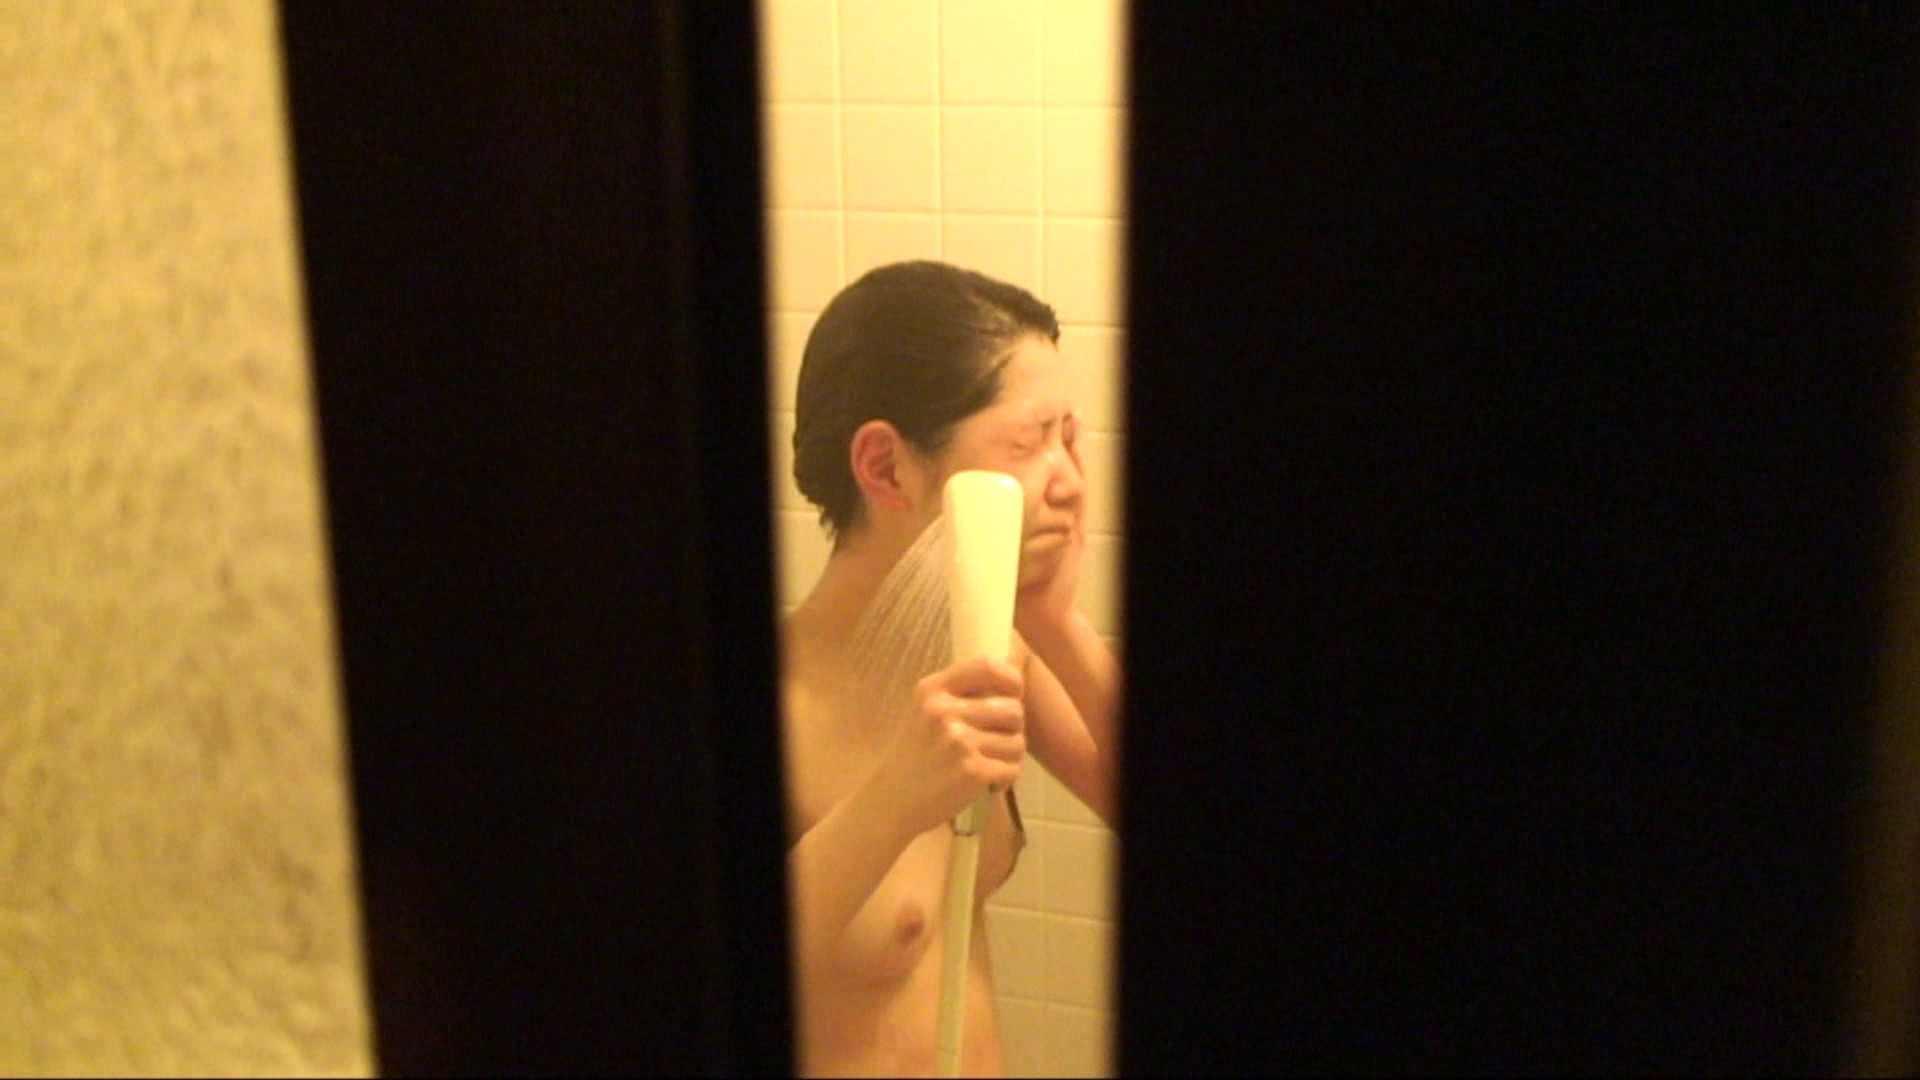 vol.02超可愛すぎる彼女の裸体をハイビジョンで!至近距離での眺め最高! 覗きもの オメコ動画キャプチャ 75枚 62